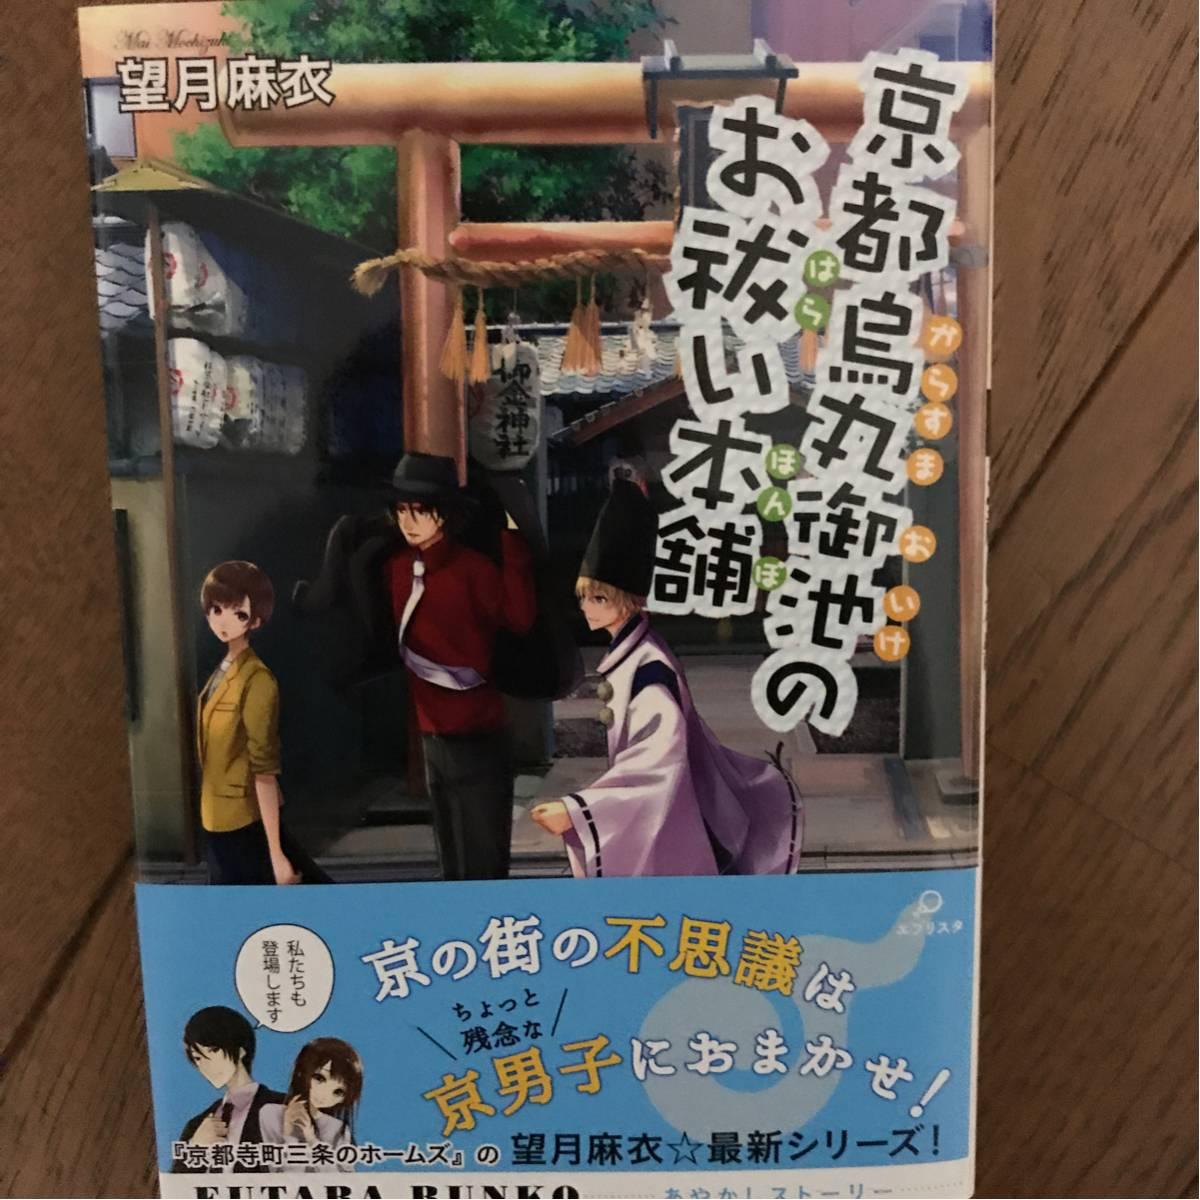 京都烏丸御池のお祓い本舗/望月麻衣/双葉文庫